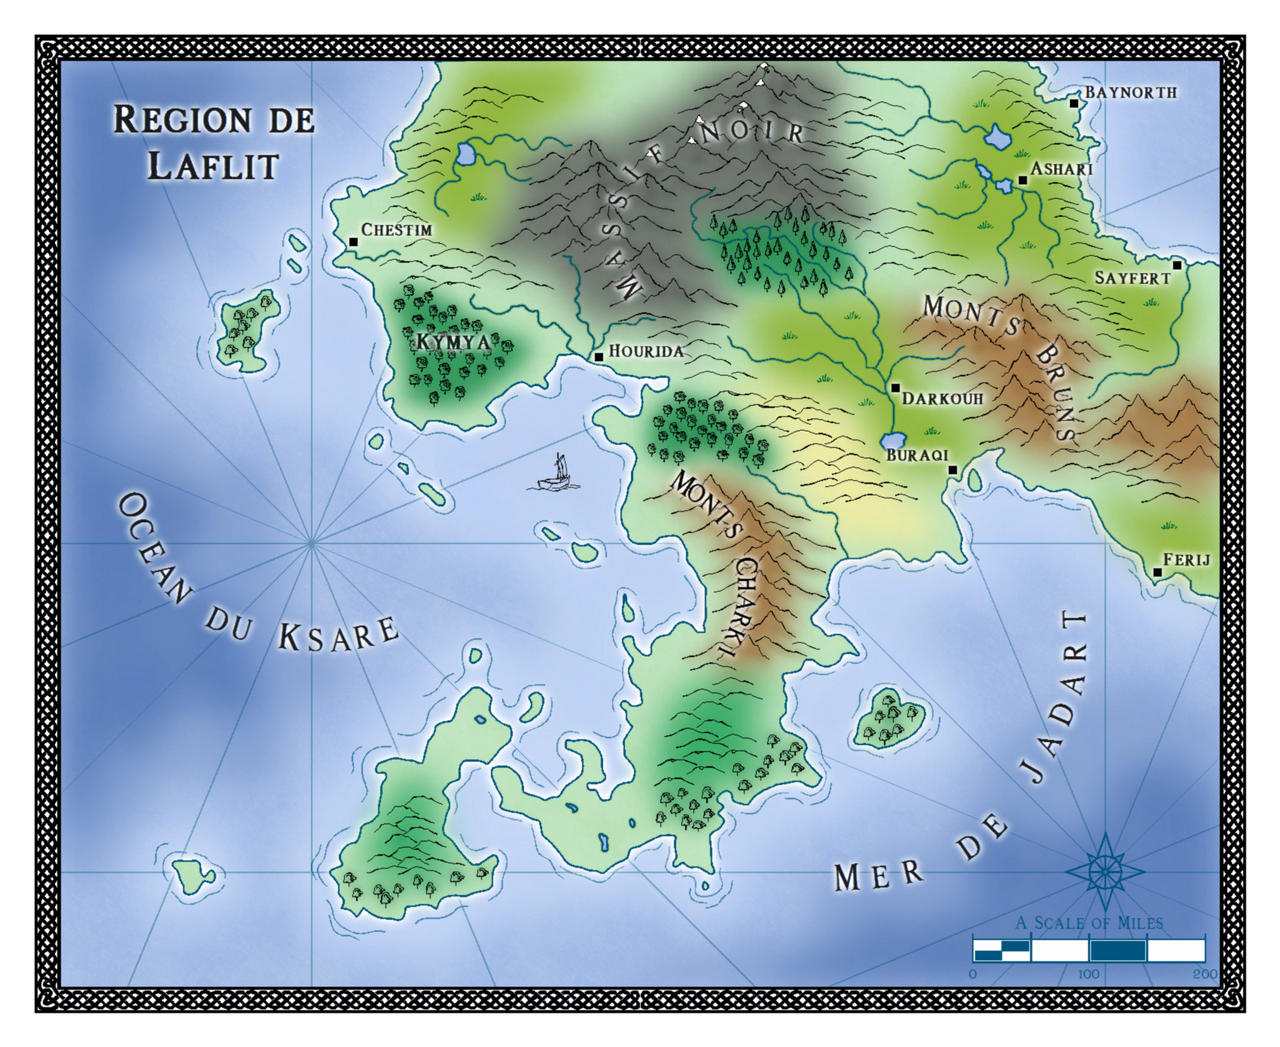 Terra incognita 4 1700 px